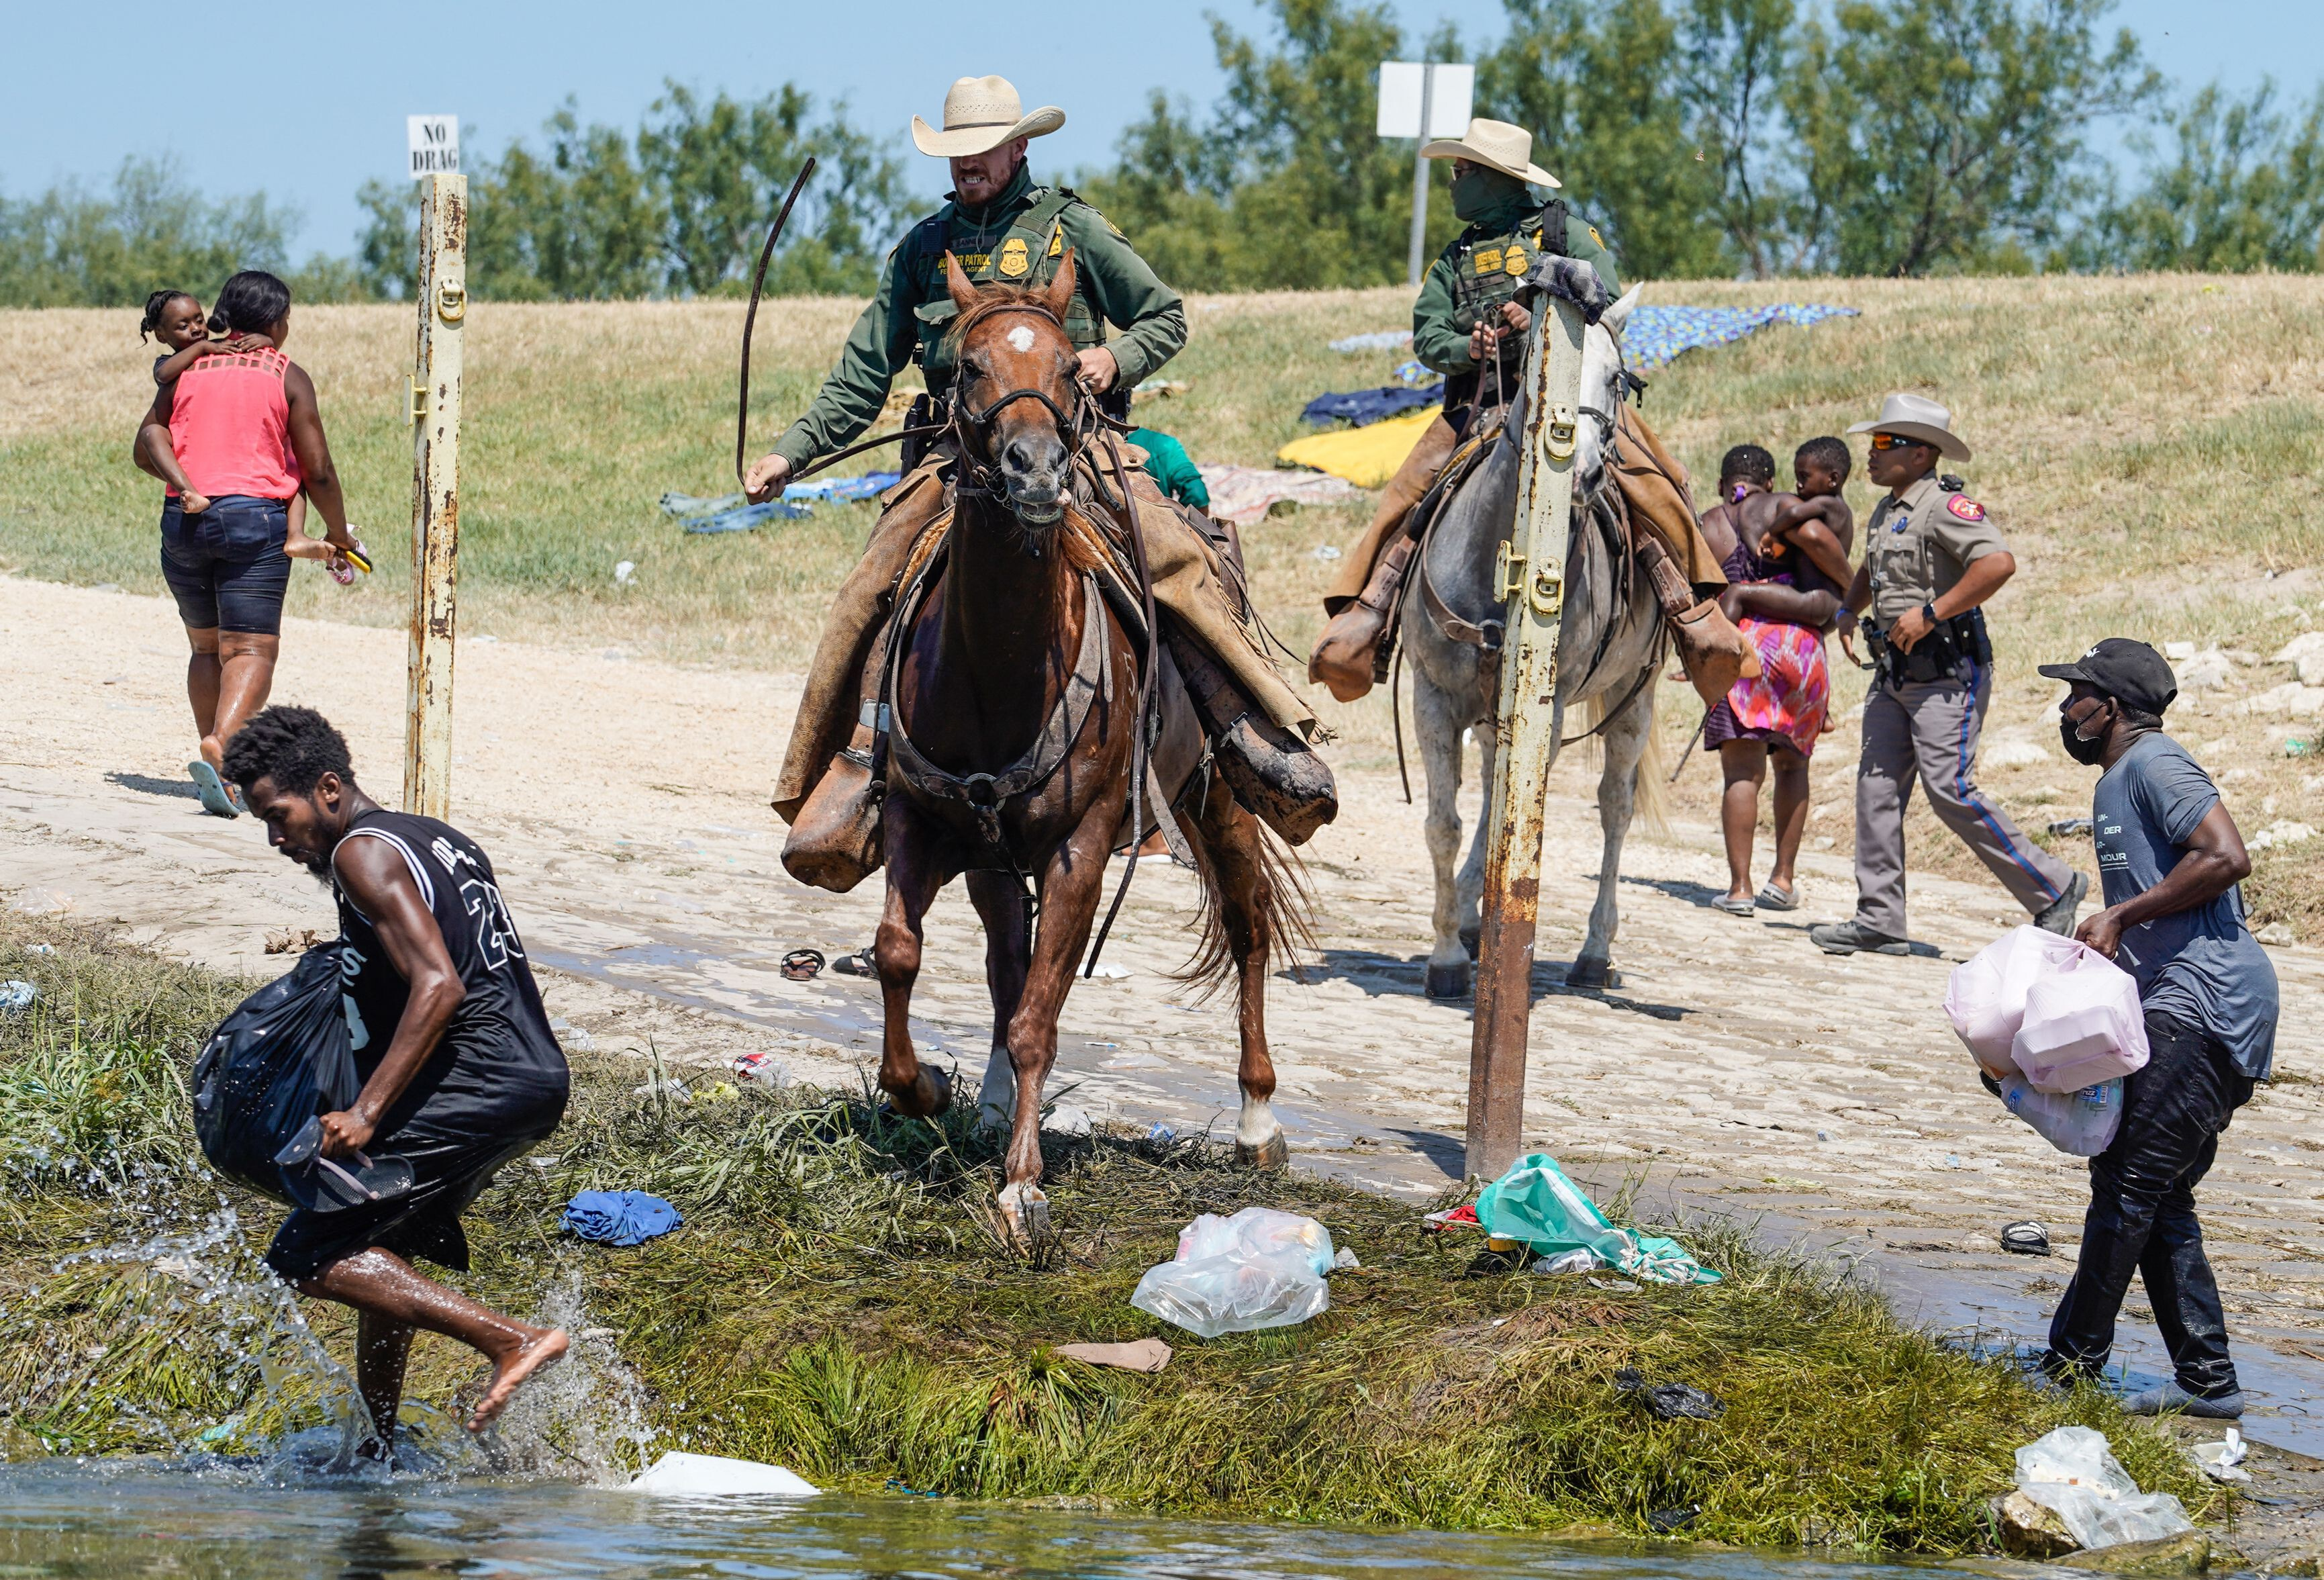 Democrats blast Biden administration on handling of Haitian immigrants at the border